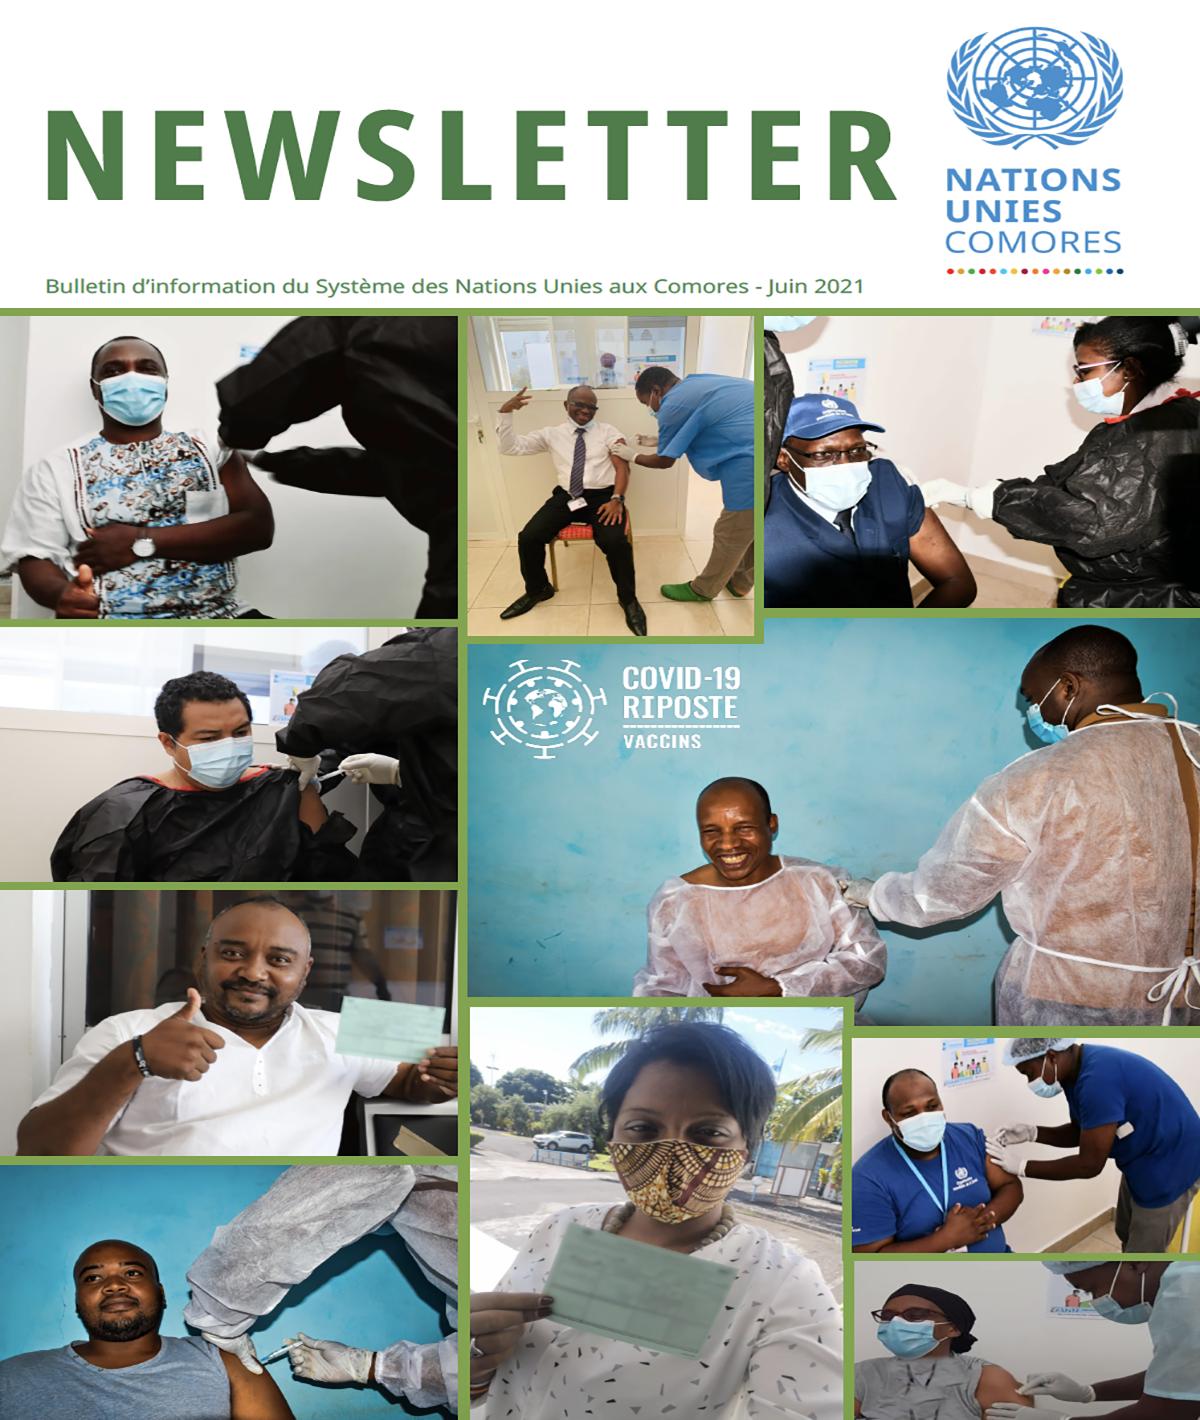 Newsletter - Nations Unies Comores Juin 2021